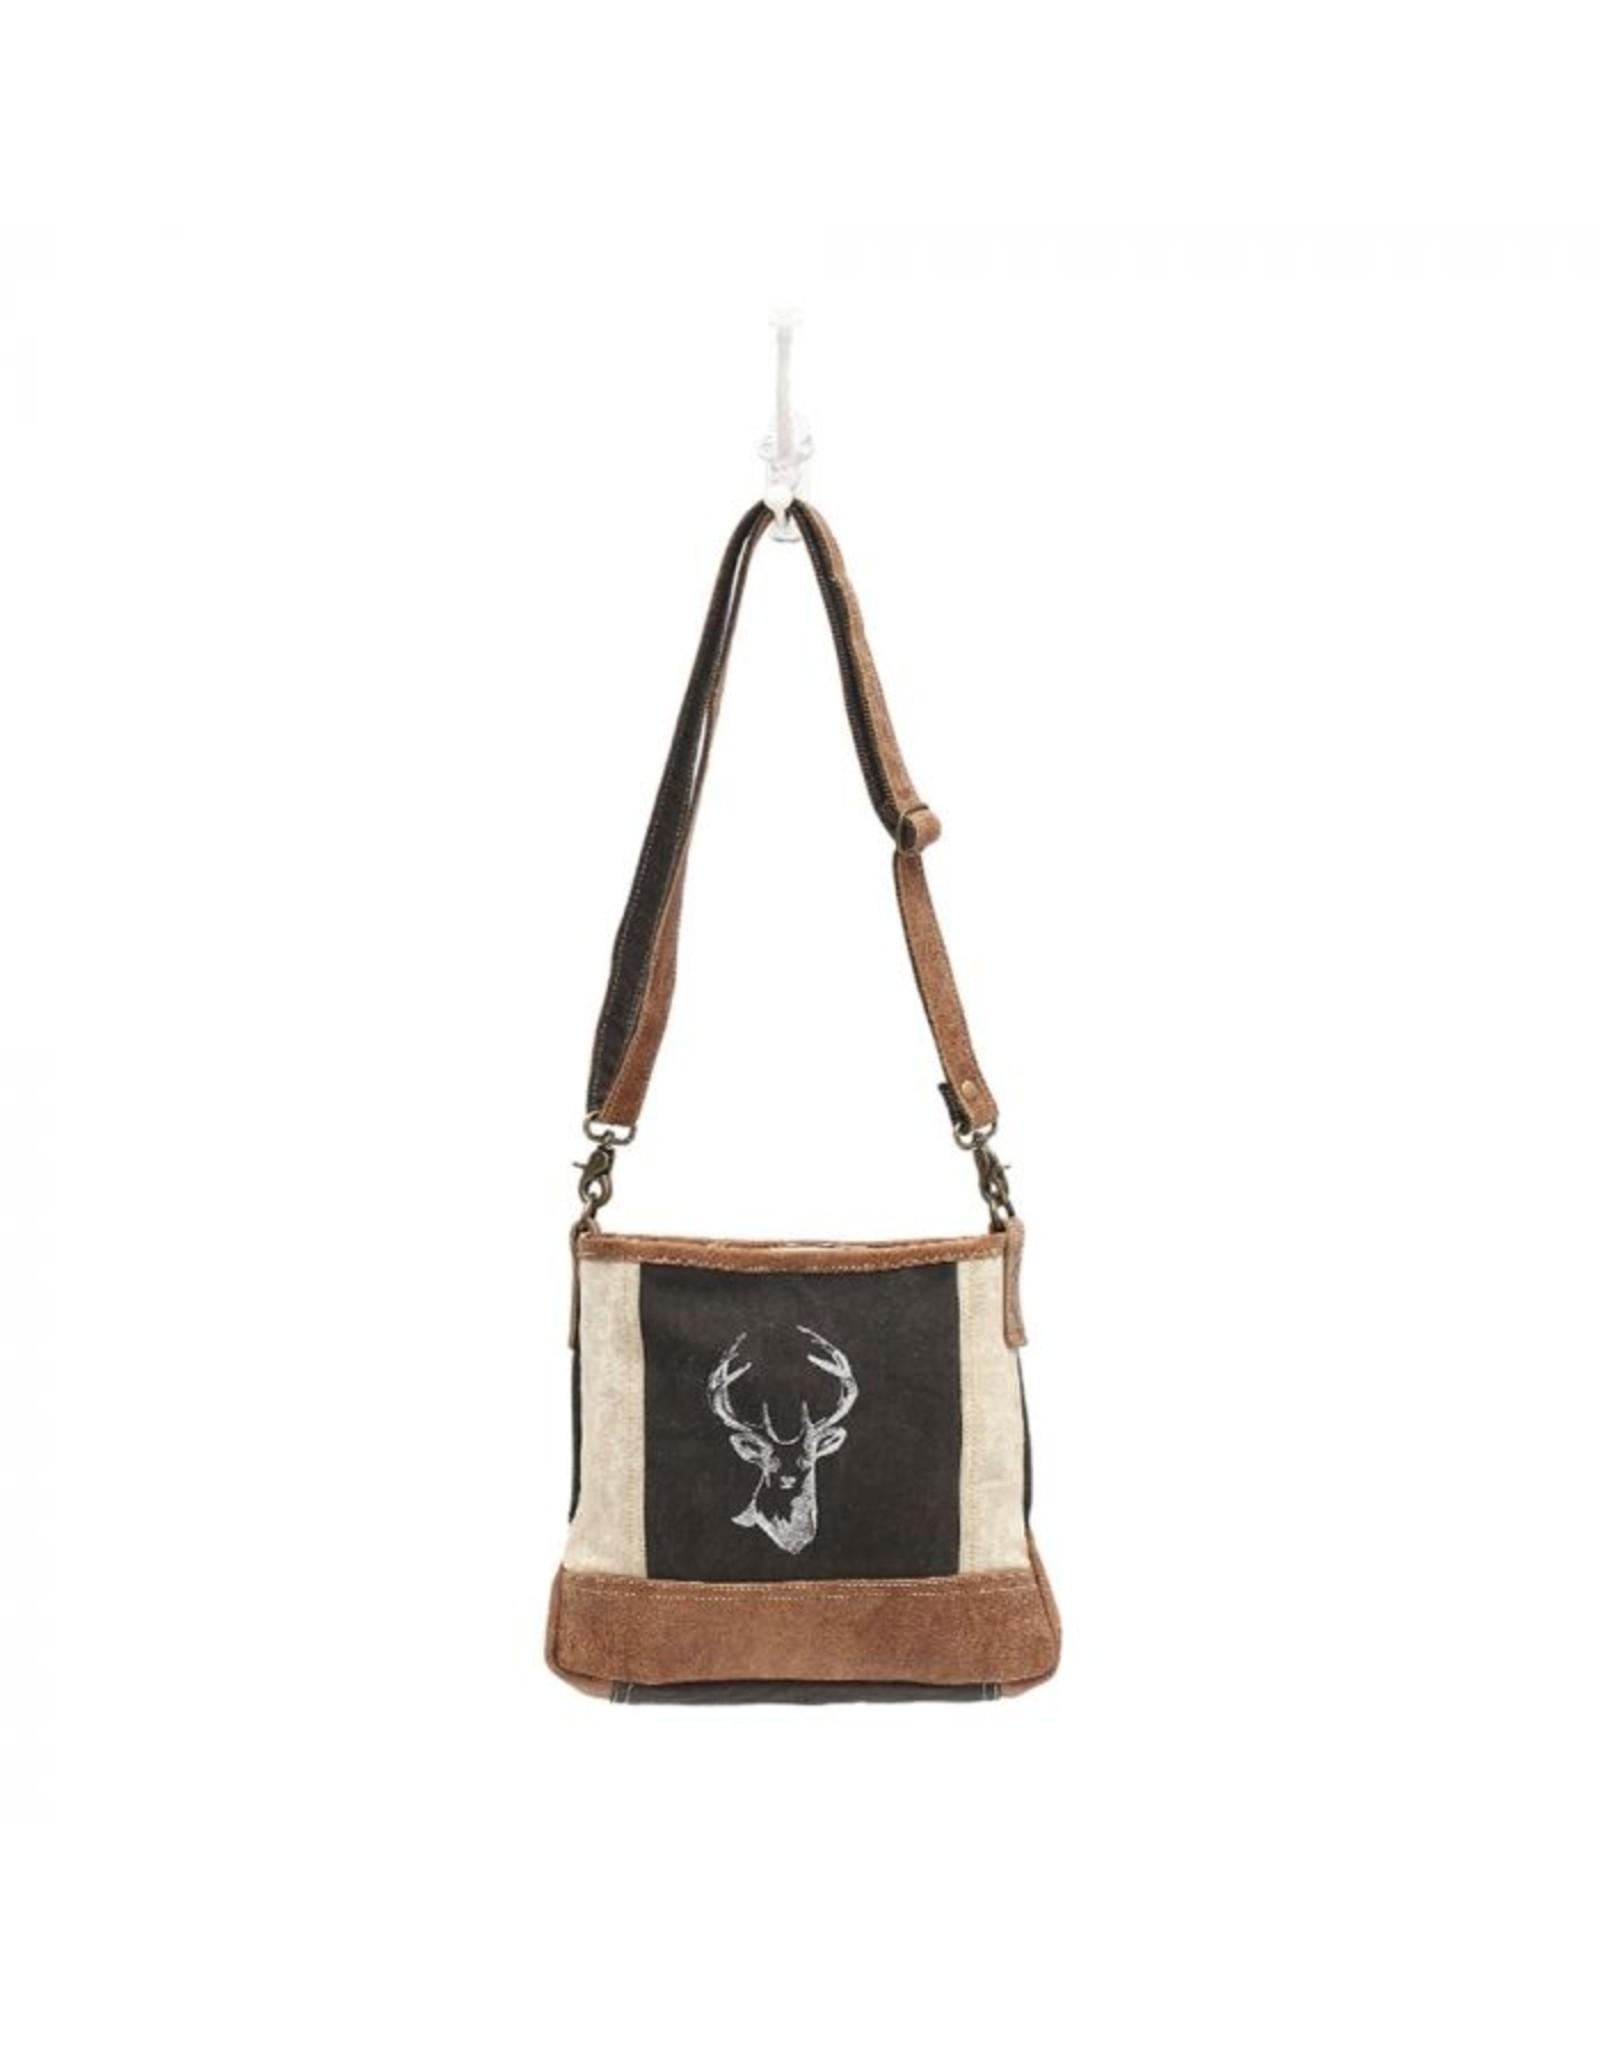 Myra Bag Deer Print Crossbody Bag